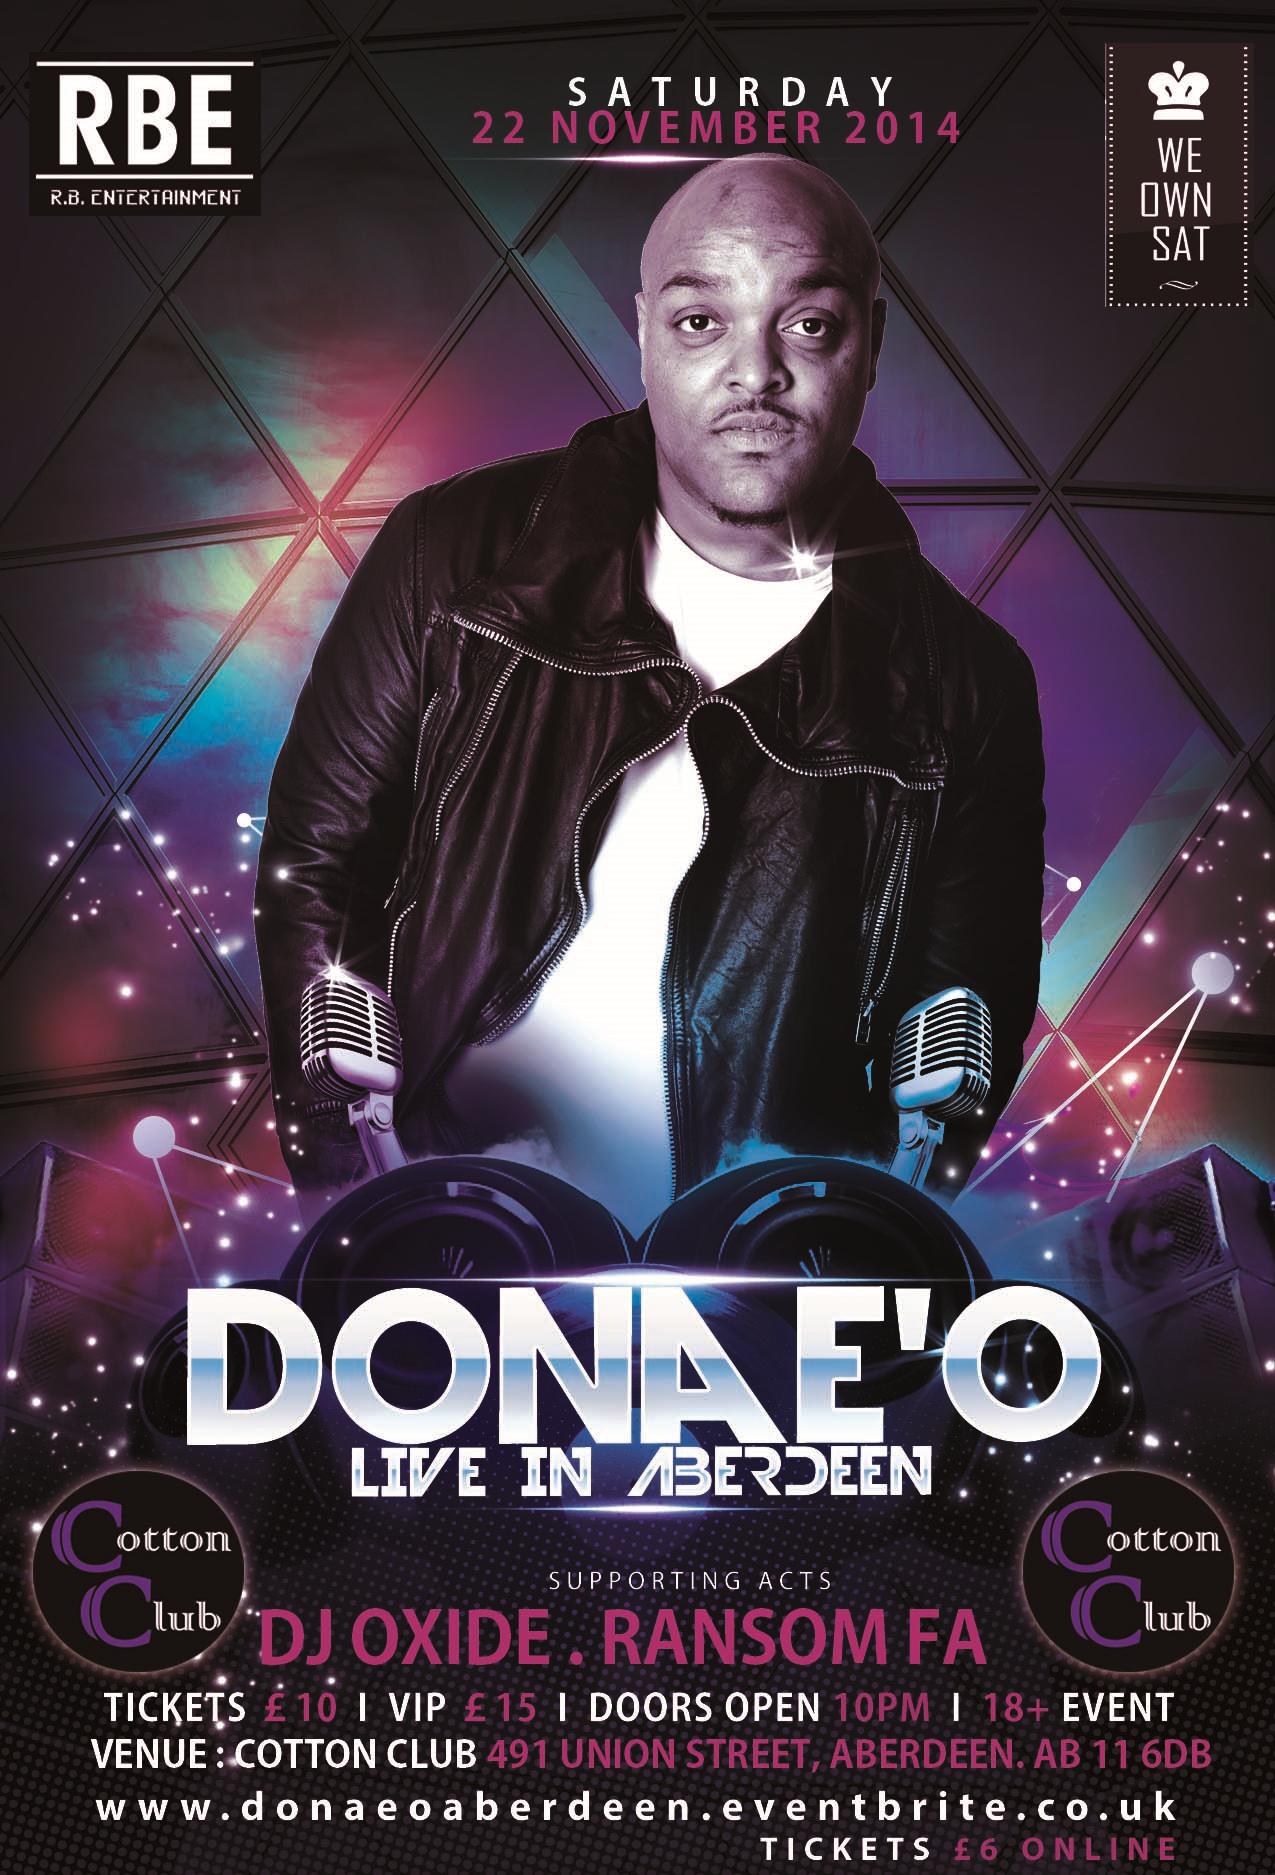 DONAE'O LIVE IN ABERDEEN